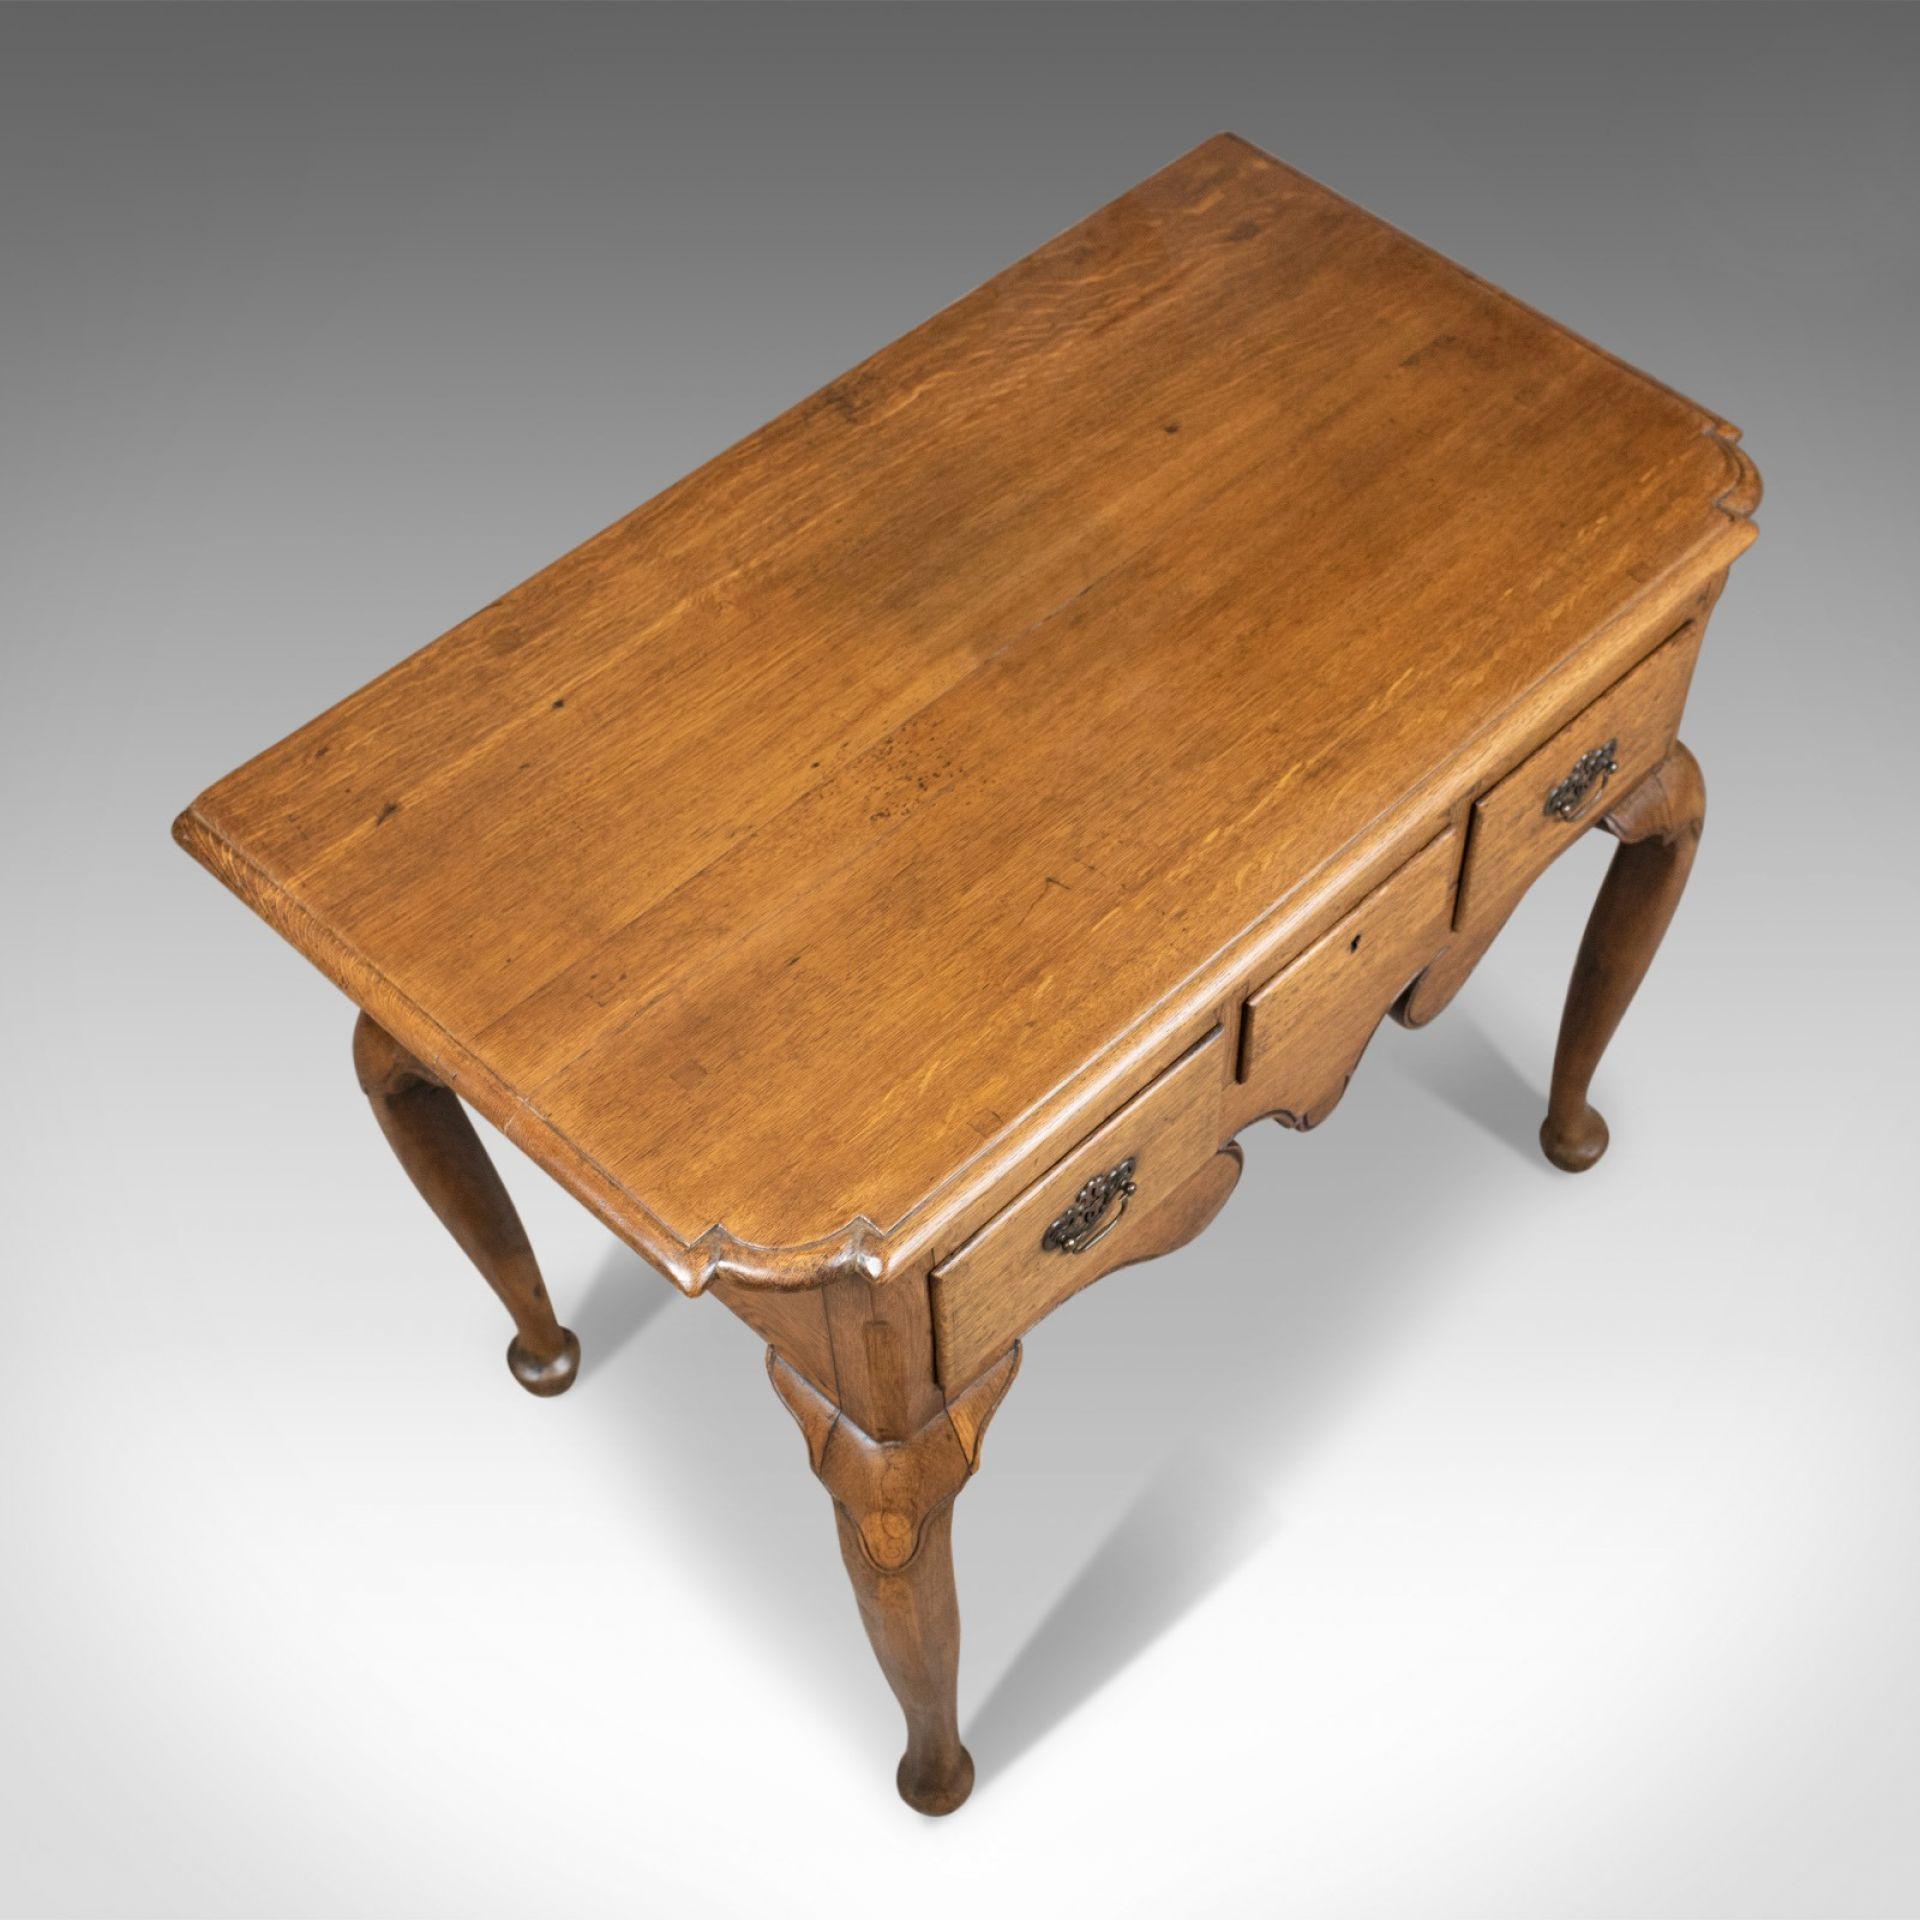 Antique Lowboy, English, Late Victorian, Oak Table, Circa 1900